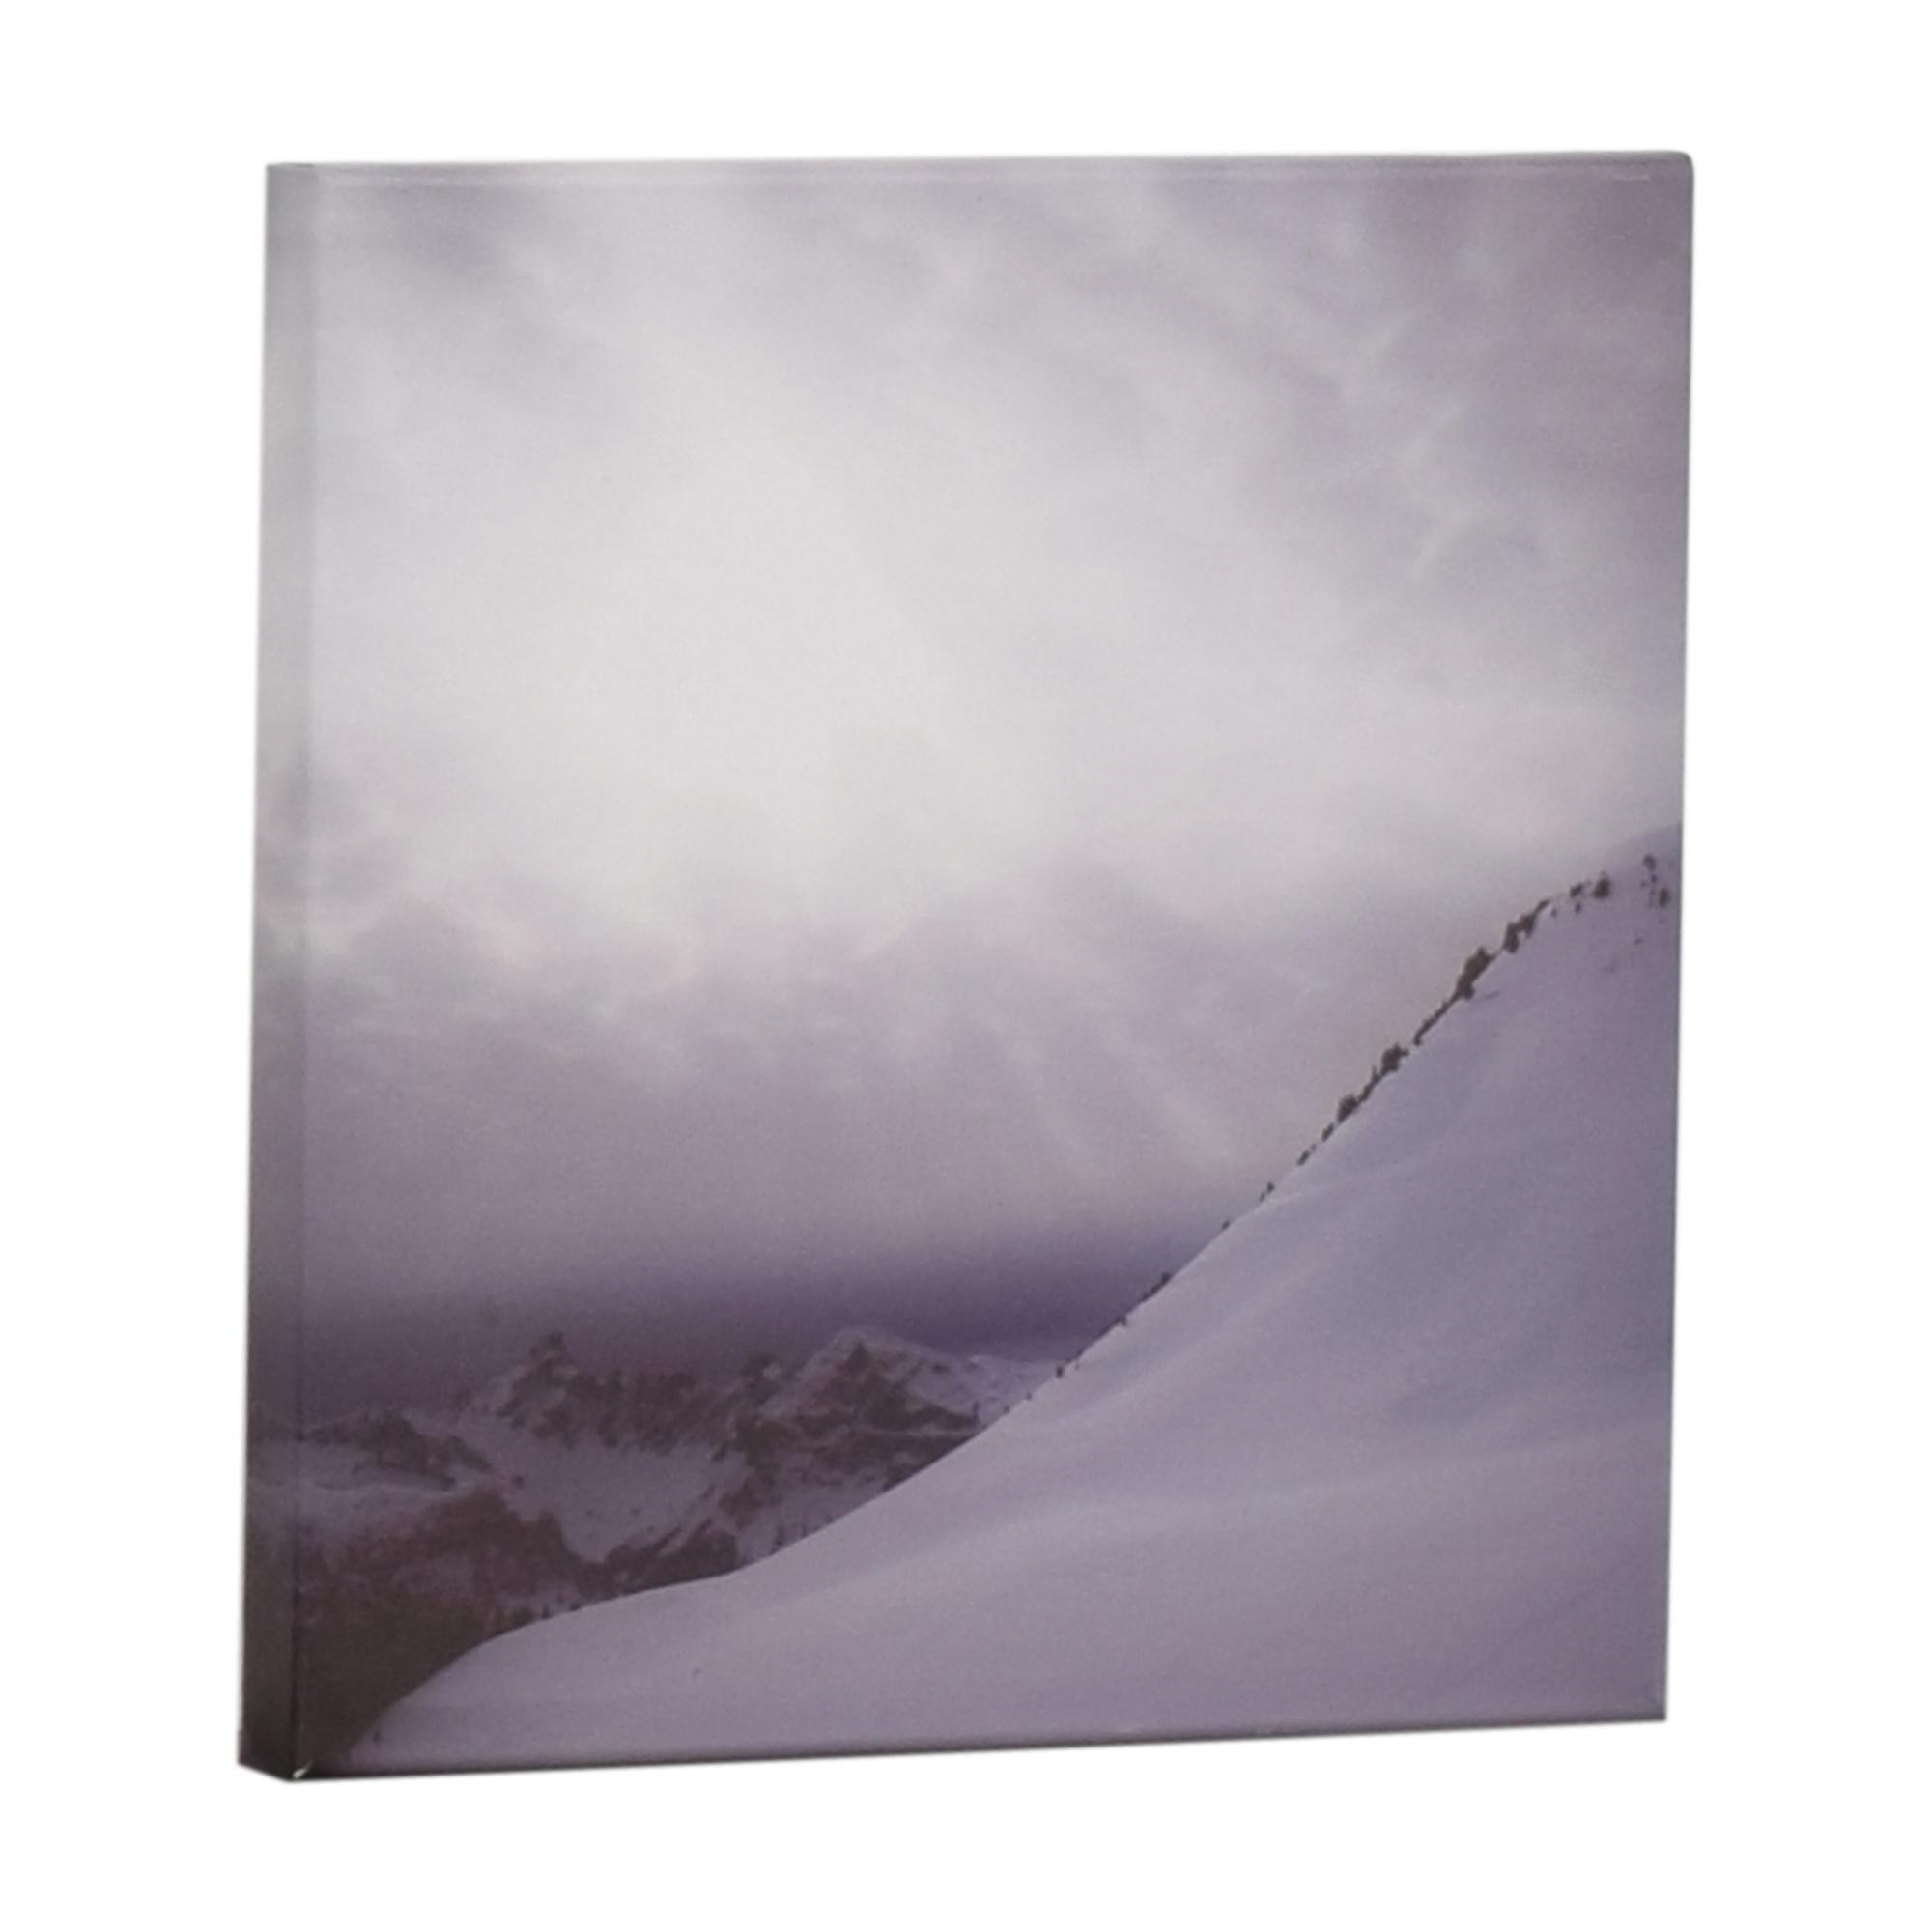 Snowy Mountain Wall Art used